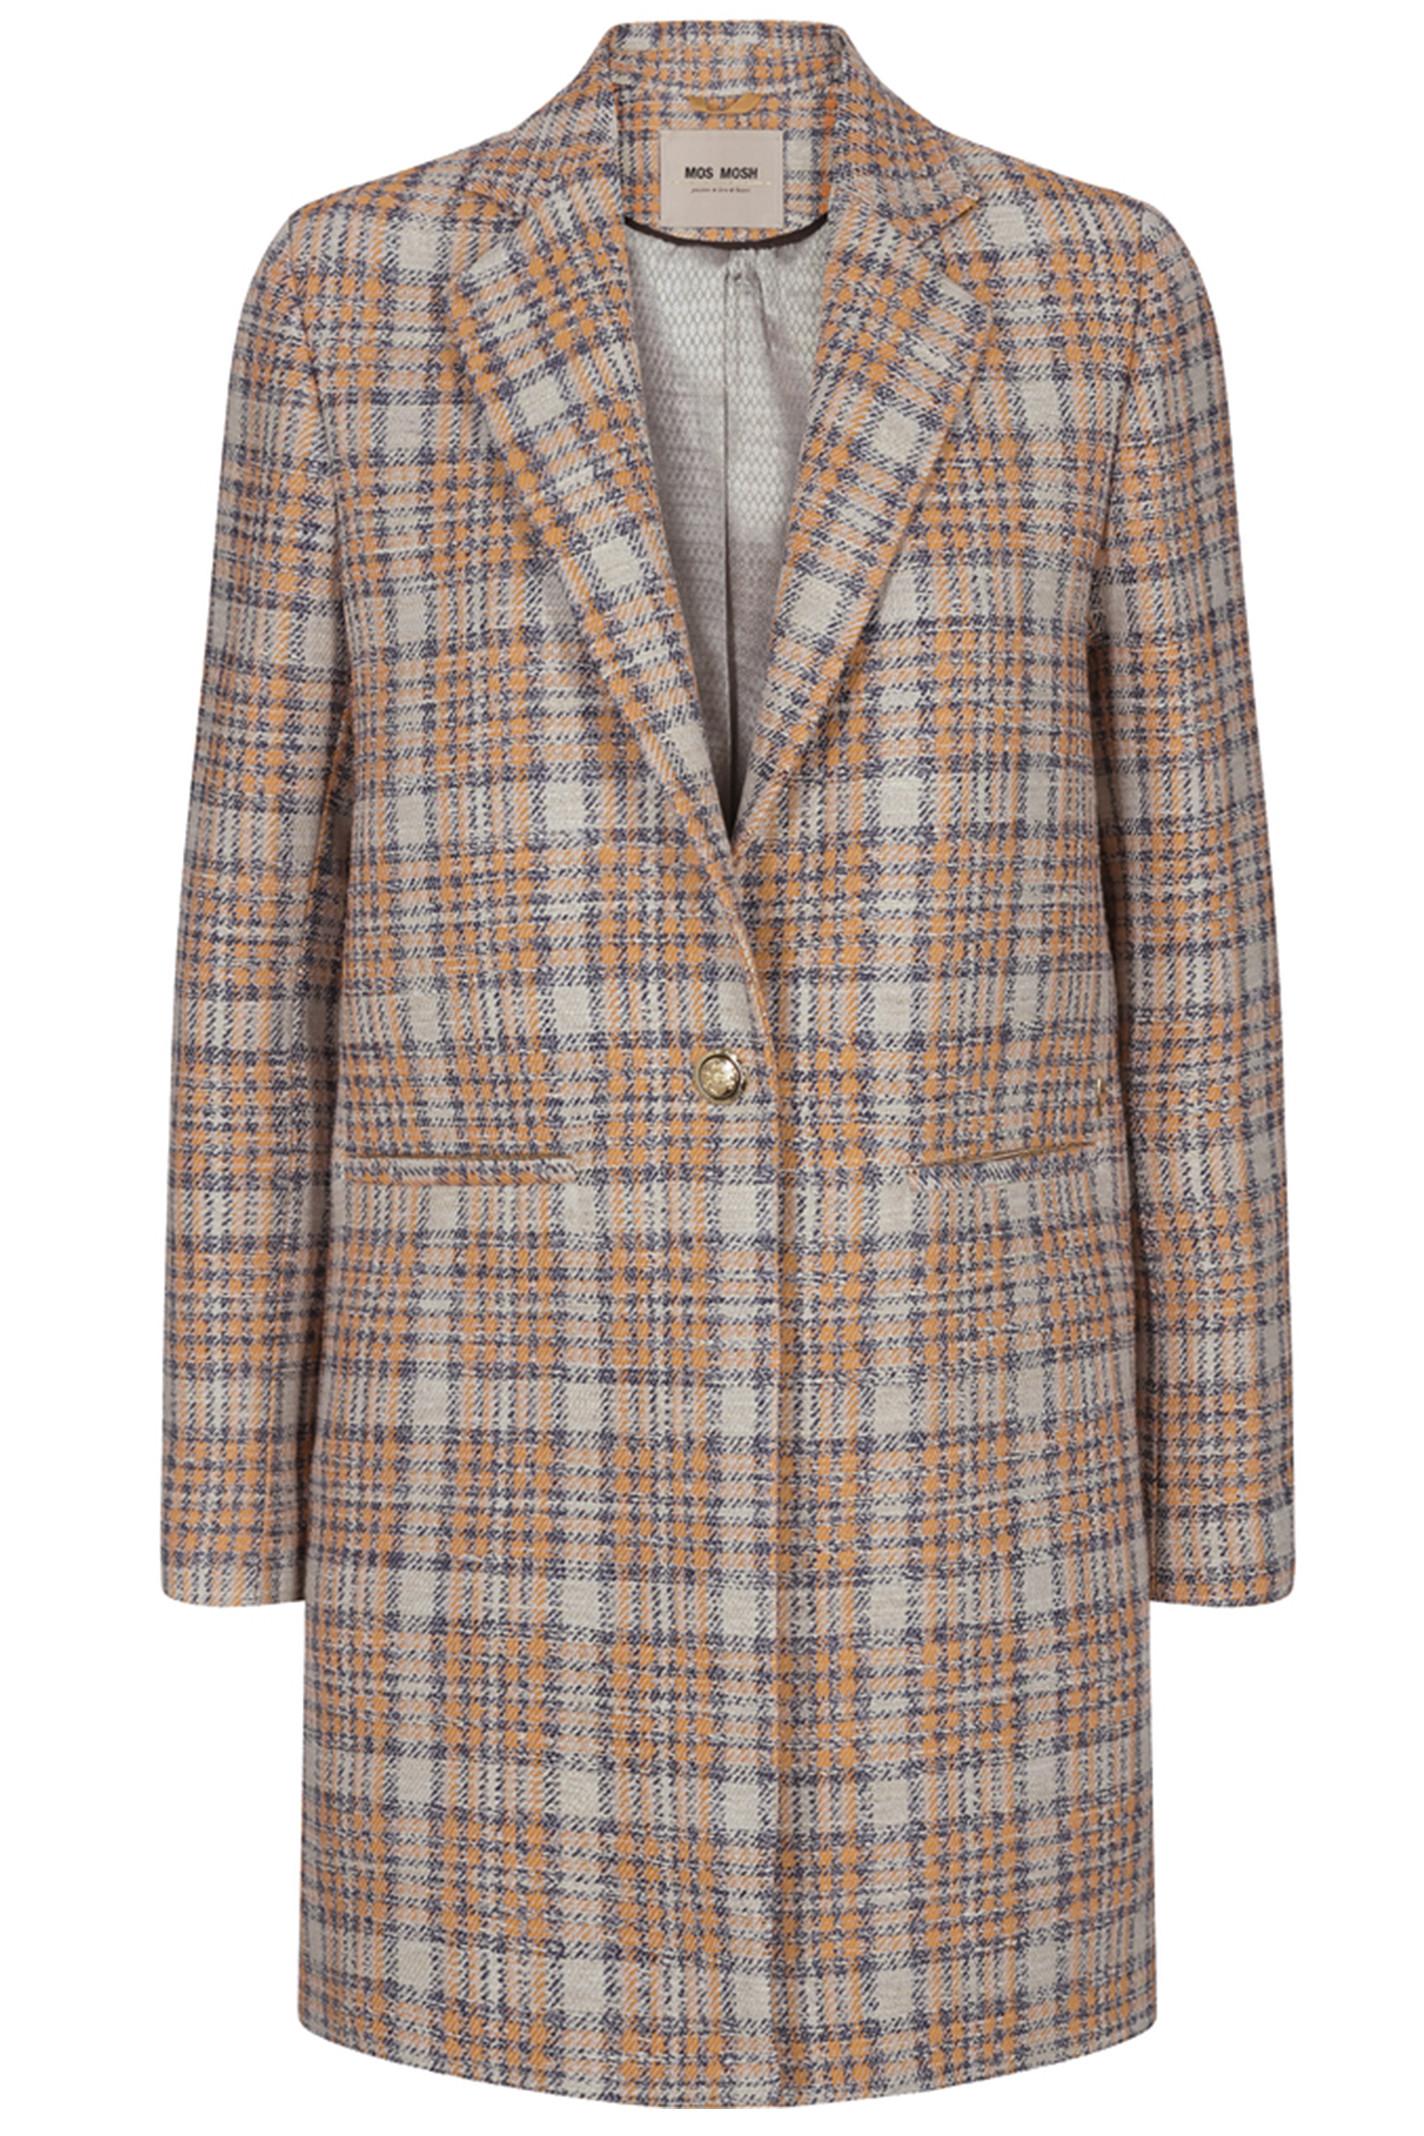 MOS MOSH Christie Mandarin Coat 132610 Mandarin Red